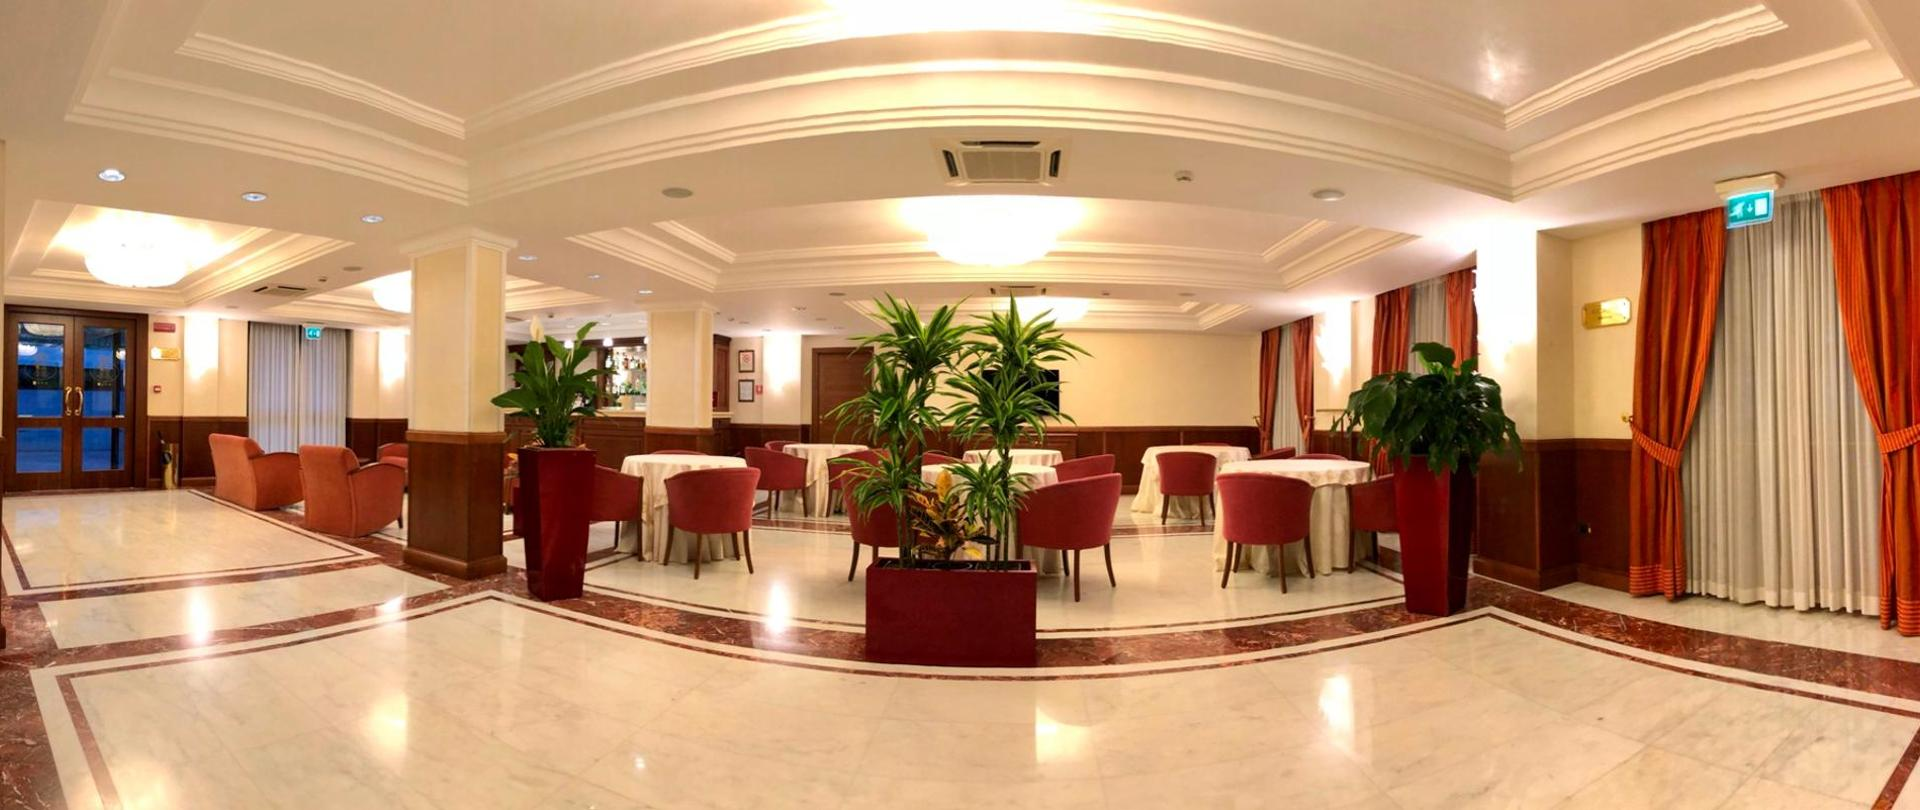 Hall-Hotel San-Giovanni-Rotondo.jpg